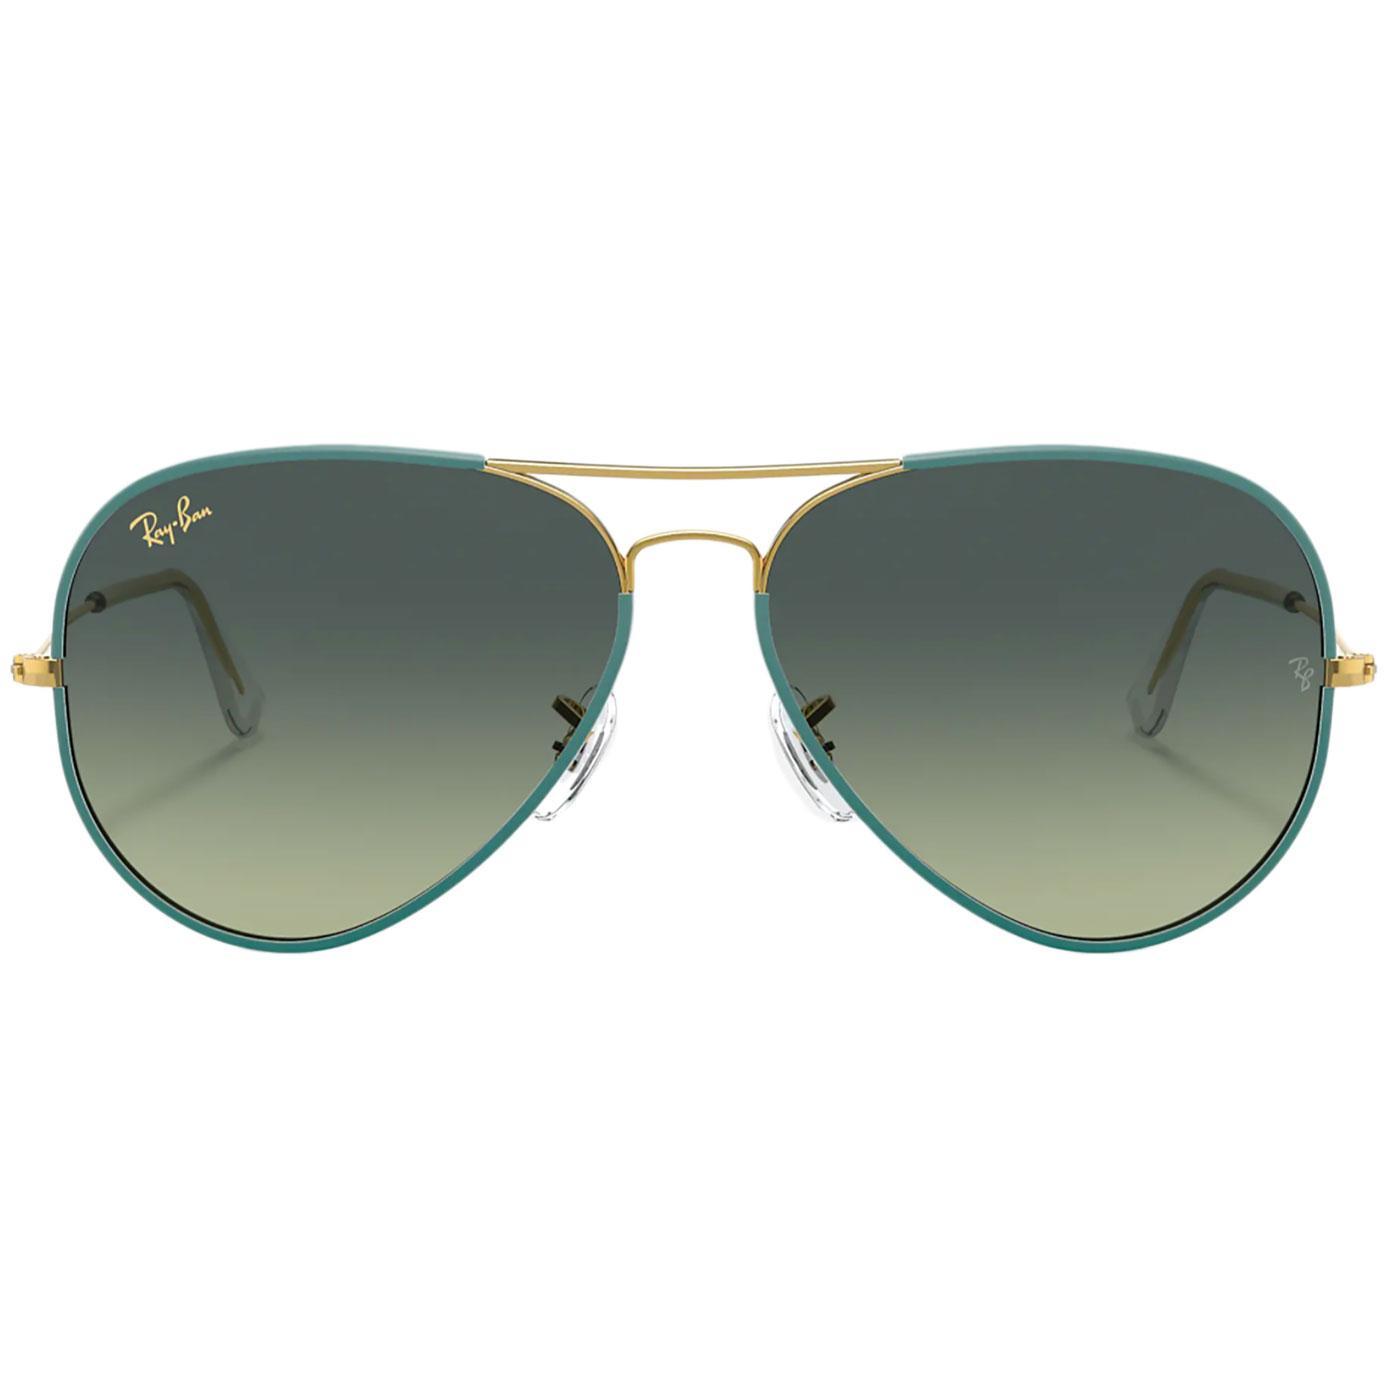 Aviator Full Colour RAY-BAN Retro 70s Sunglasses P